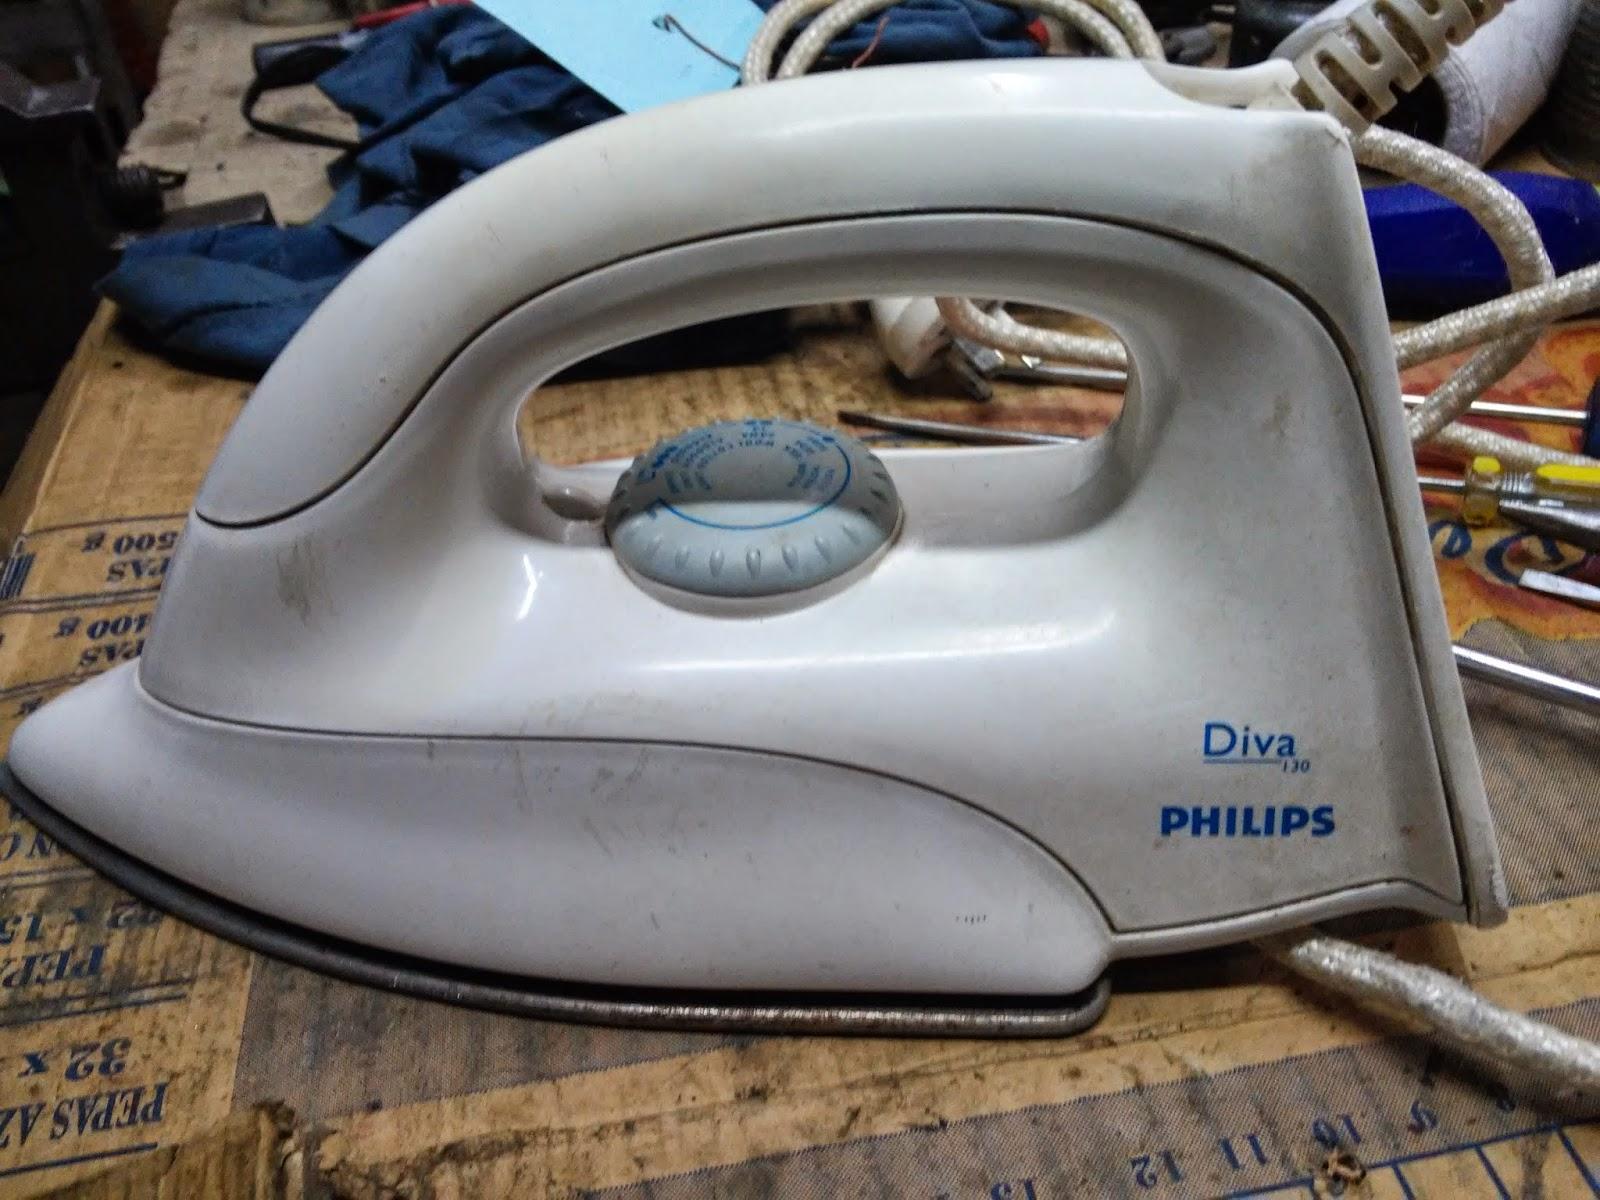 Reparar plancha Philips diva 130